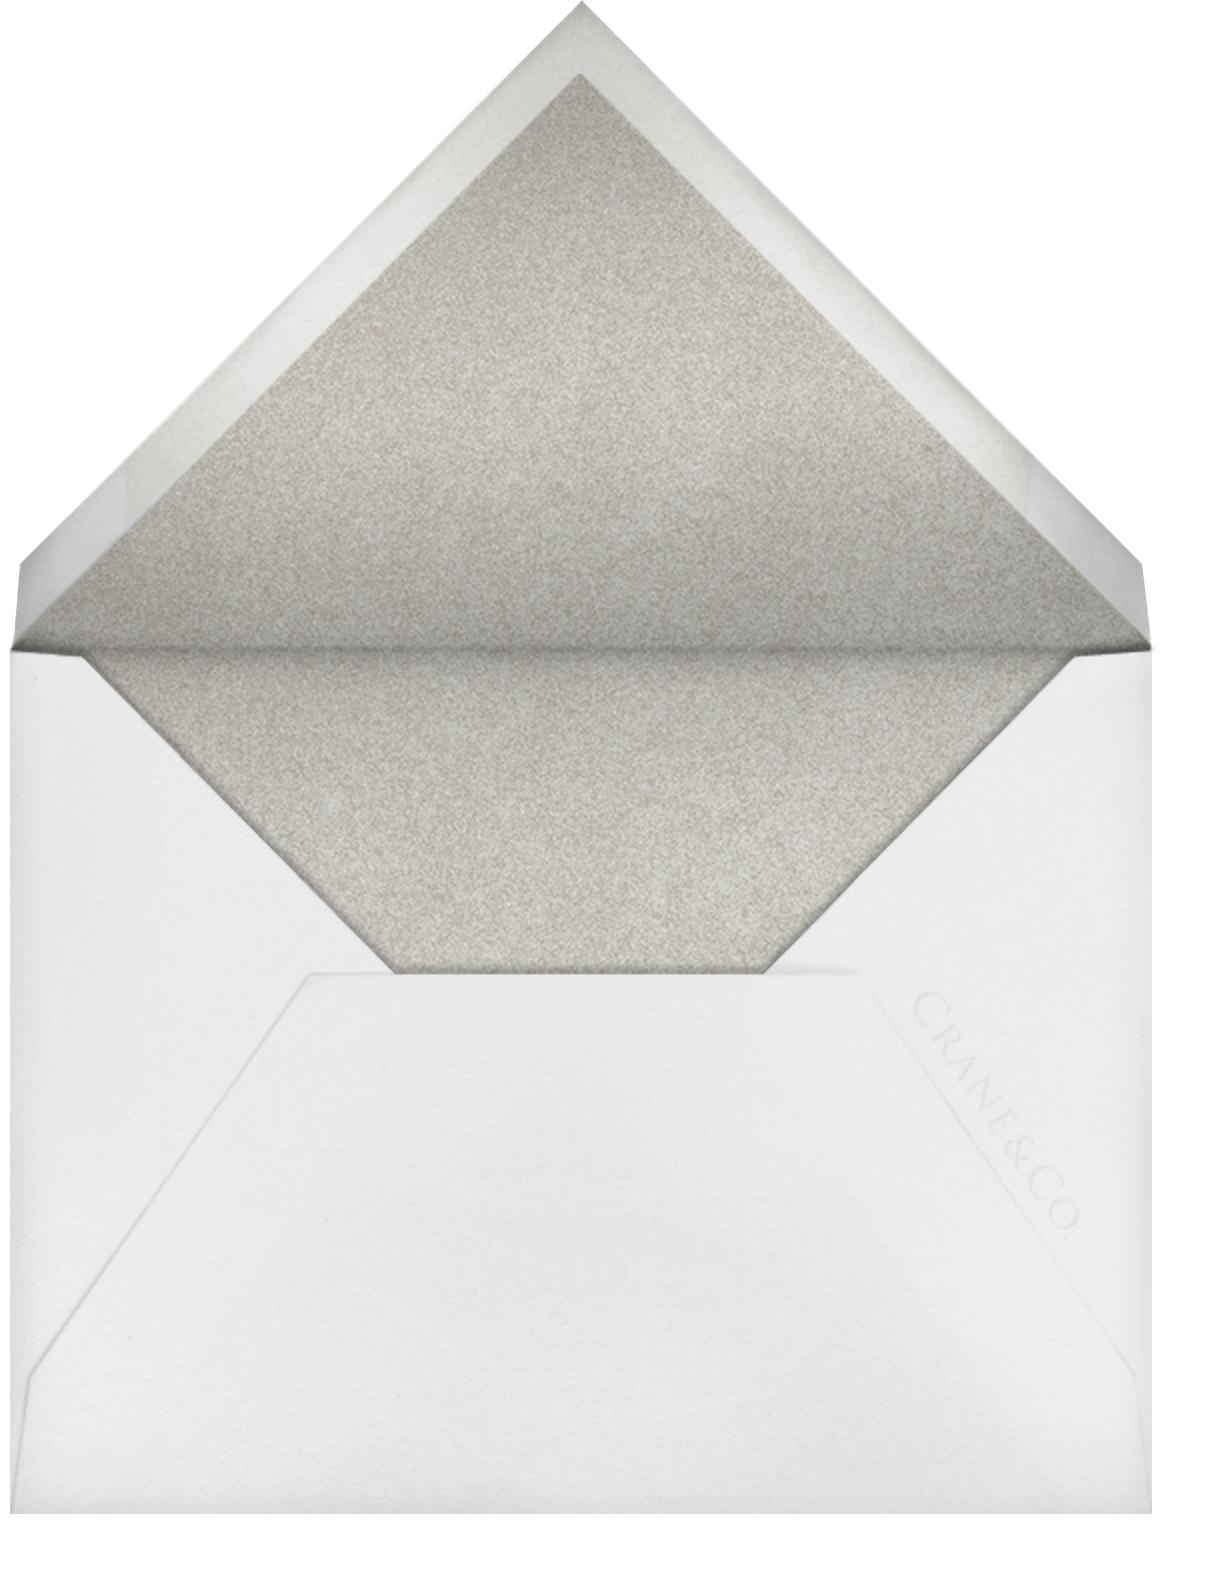 Polka Dot (Horizontal) - Platinum - Oscar de la Renta - Envelope